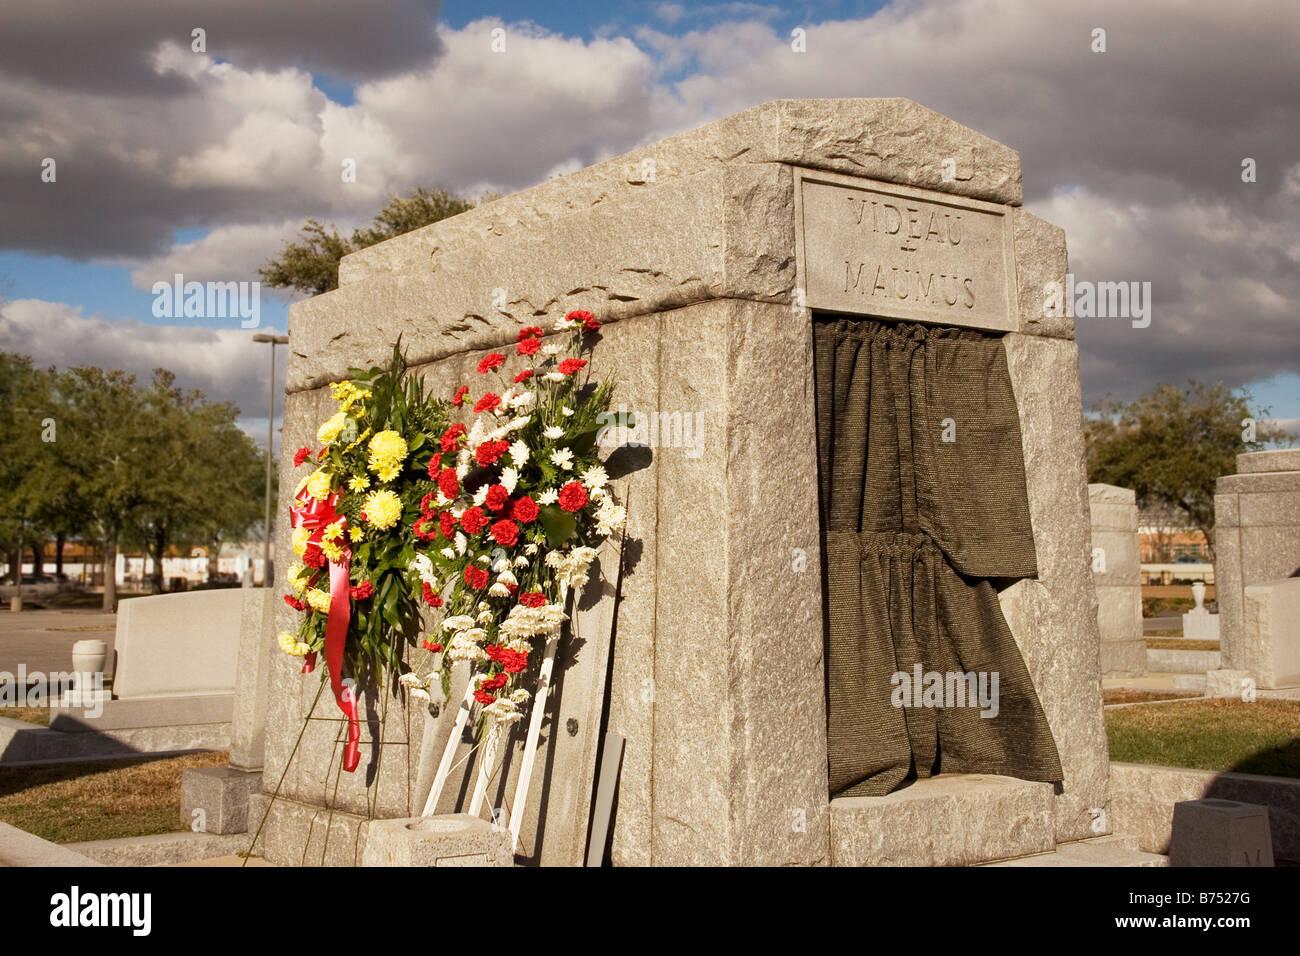 Burial Vault Stock Photos & Burial Vault Stock Images - Page 2 - Alamy